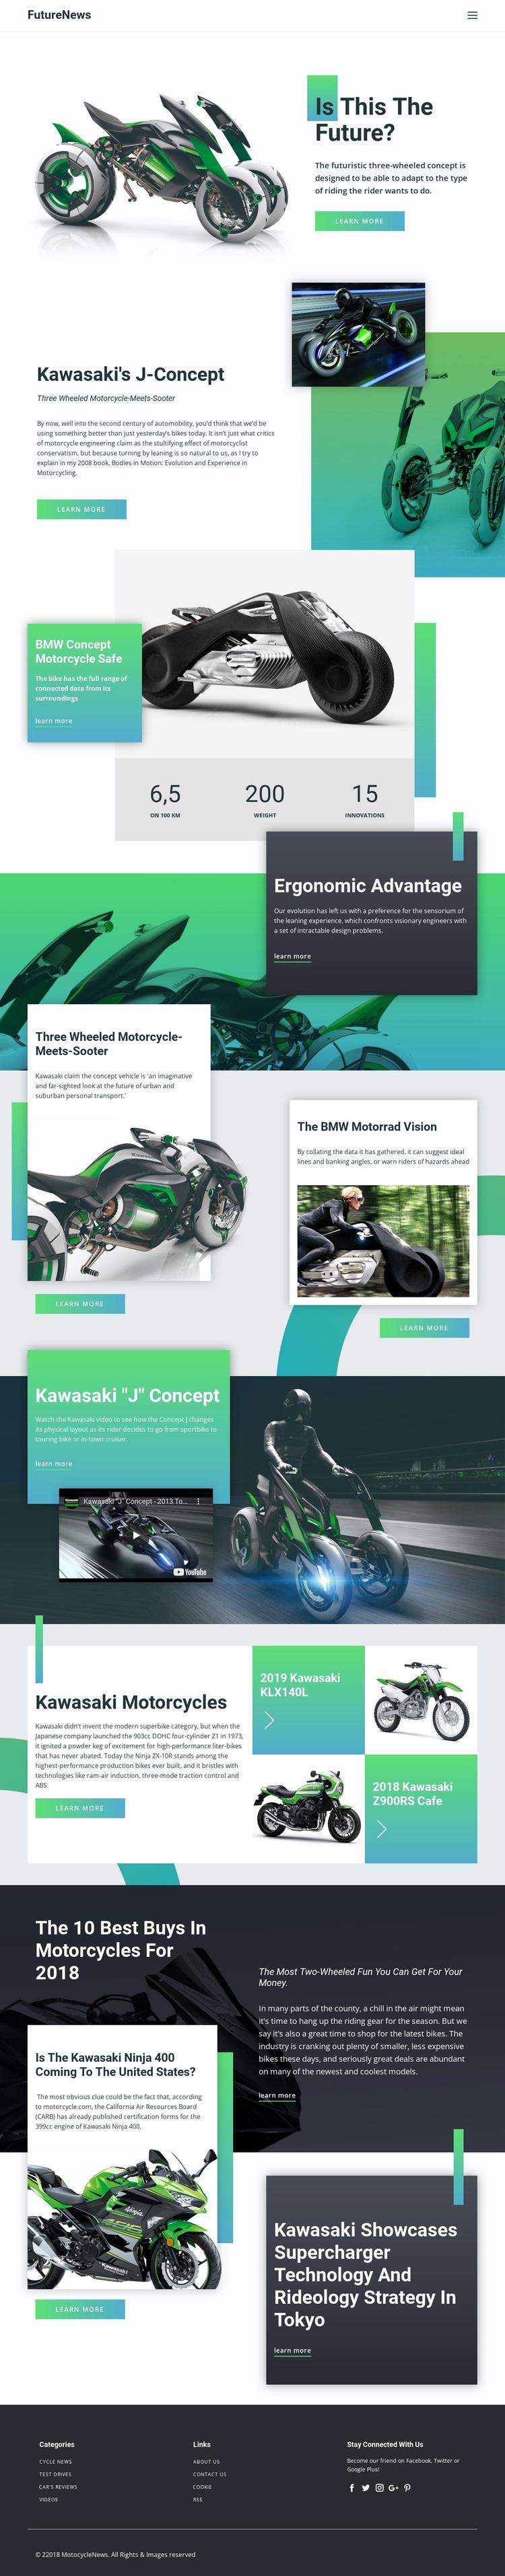 Future News Website Design